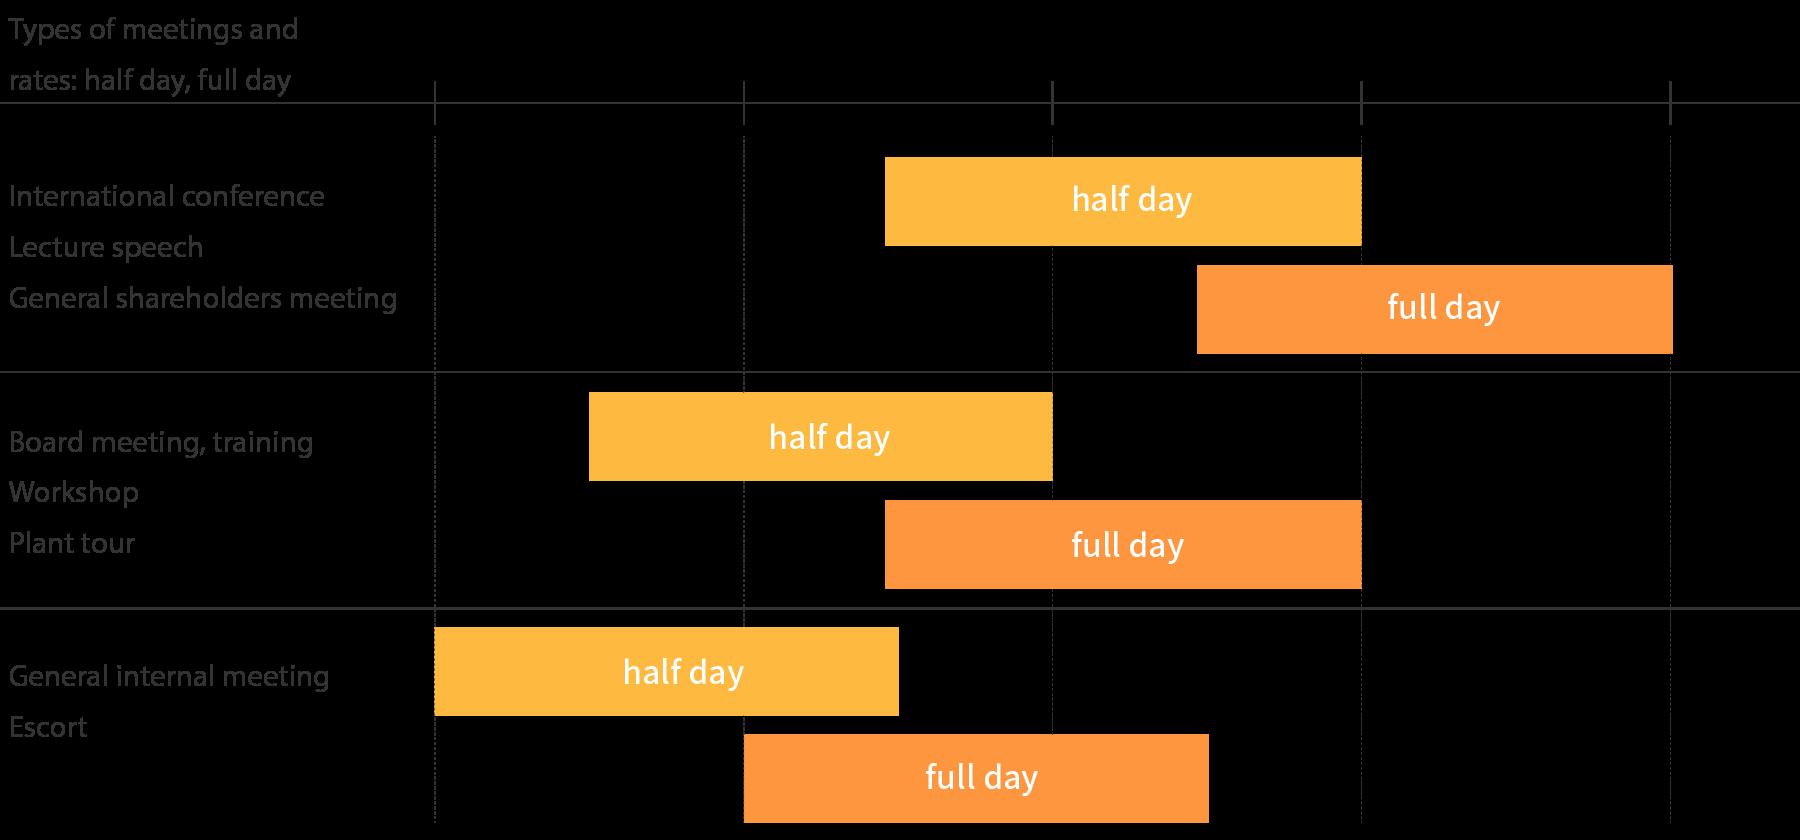 Interpreting rates (example)